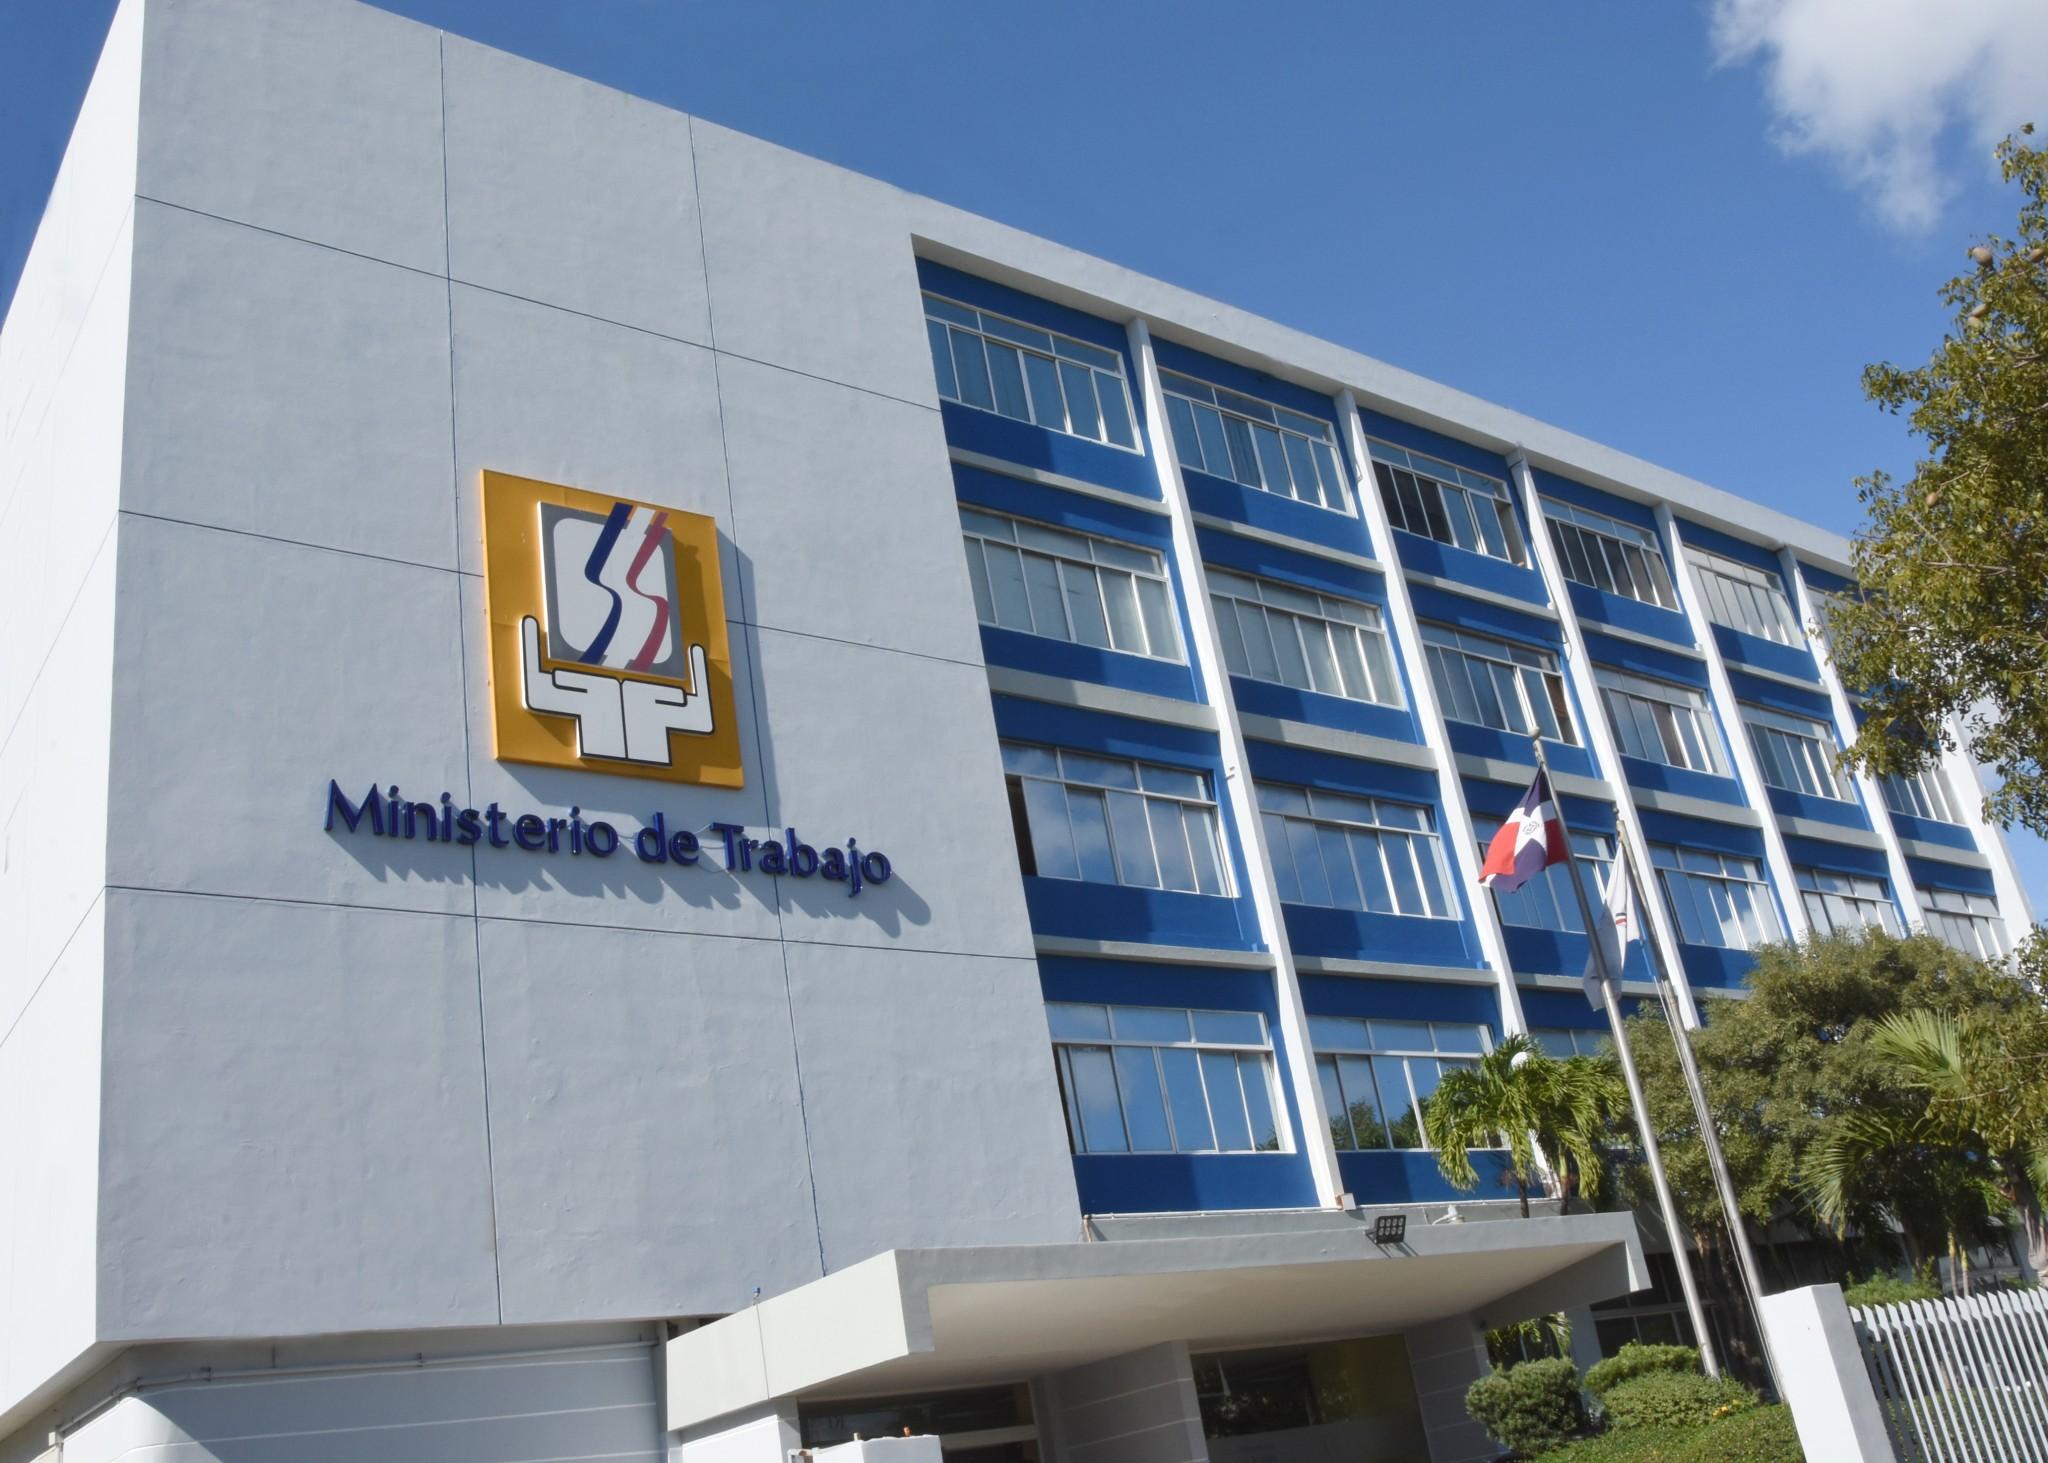 FOTO MINISTERIO DE TRABAJO